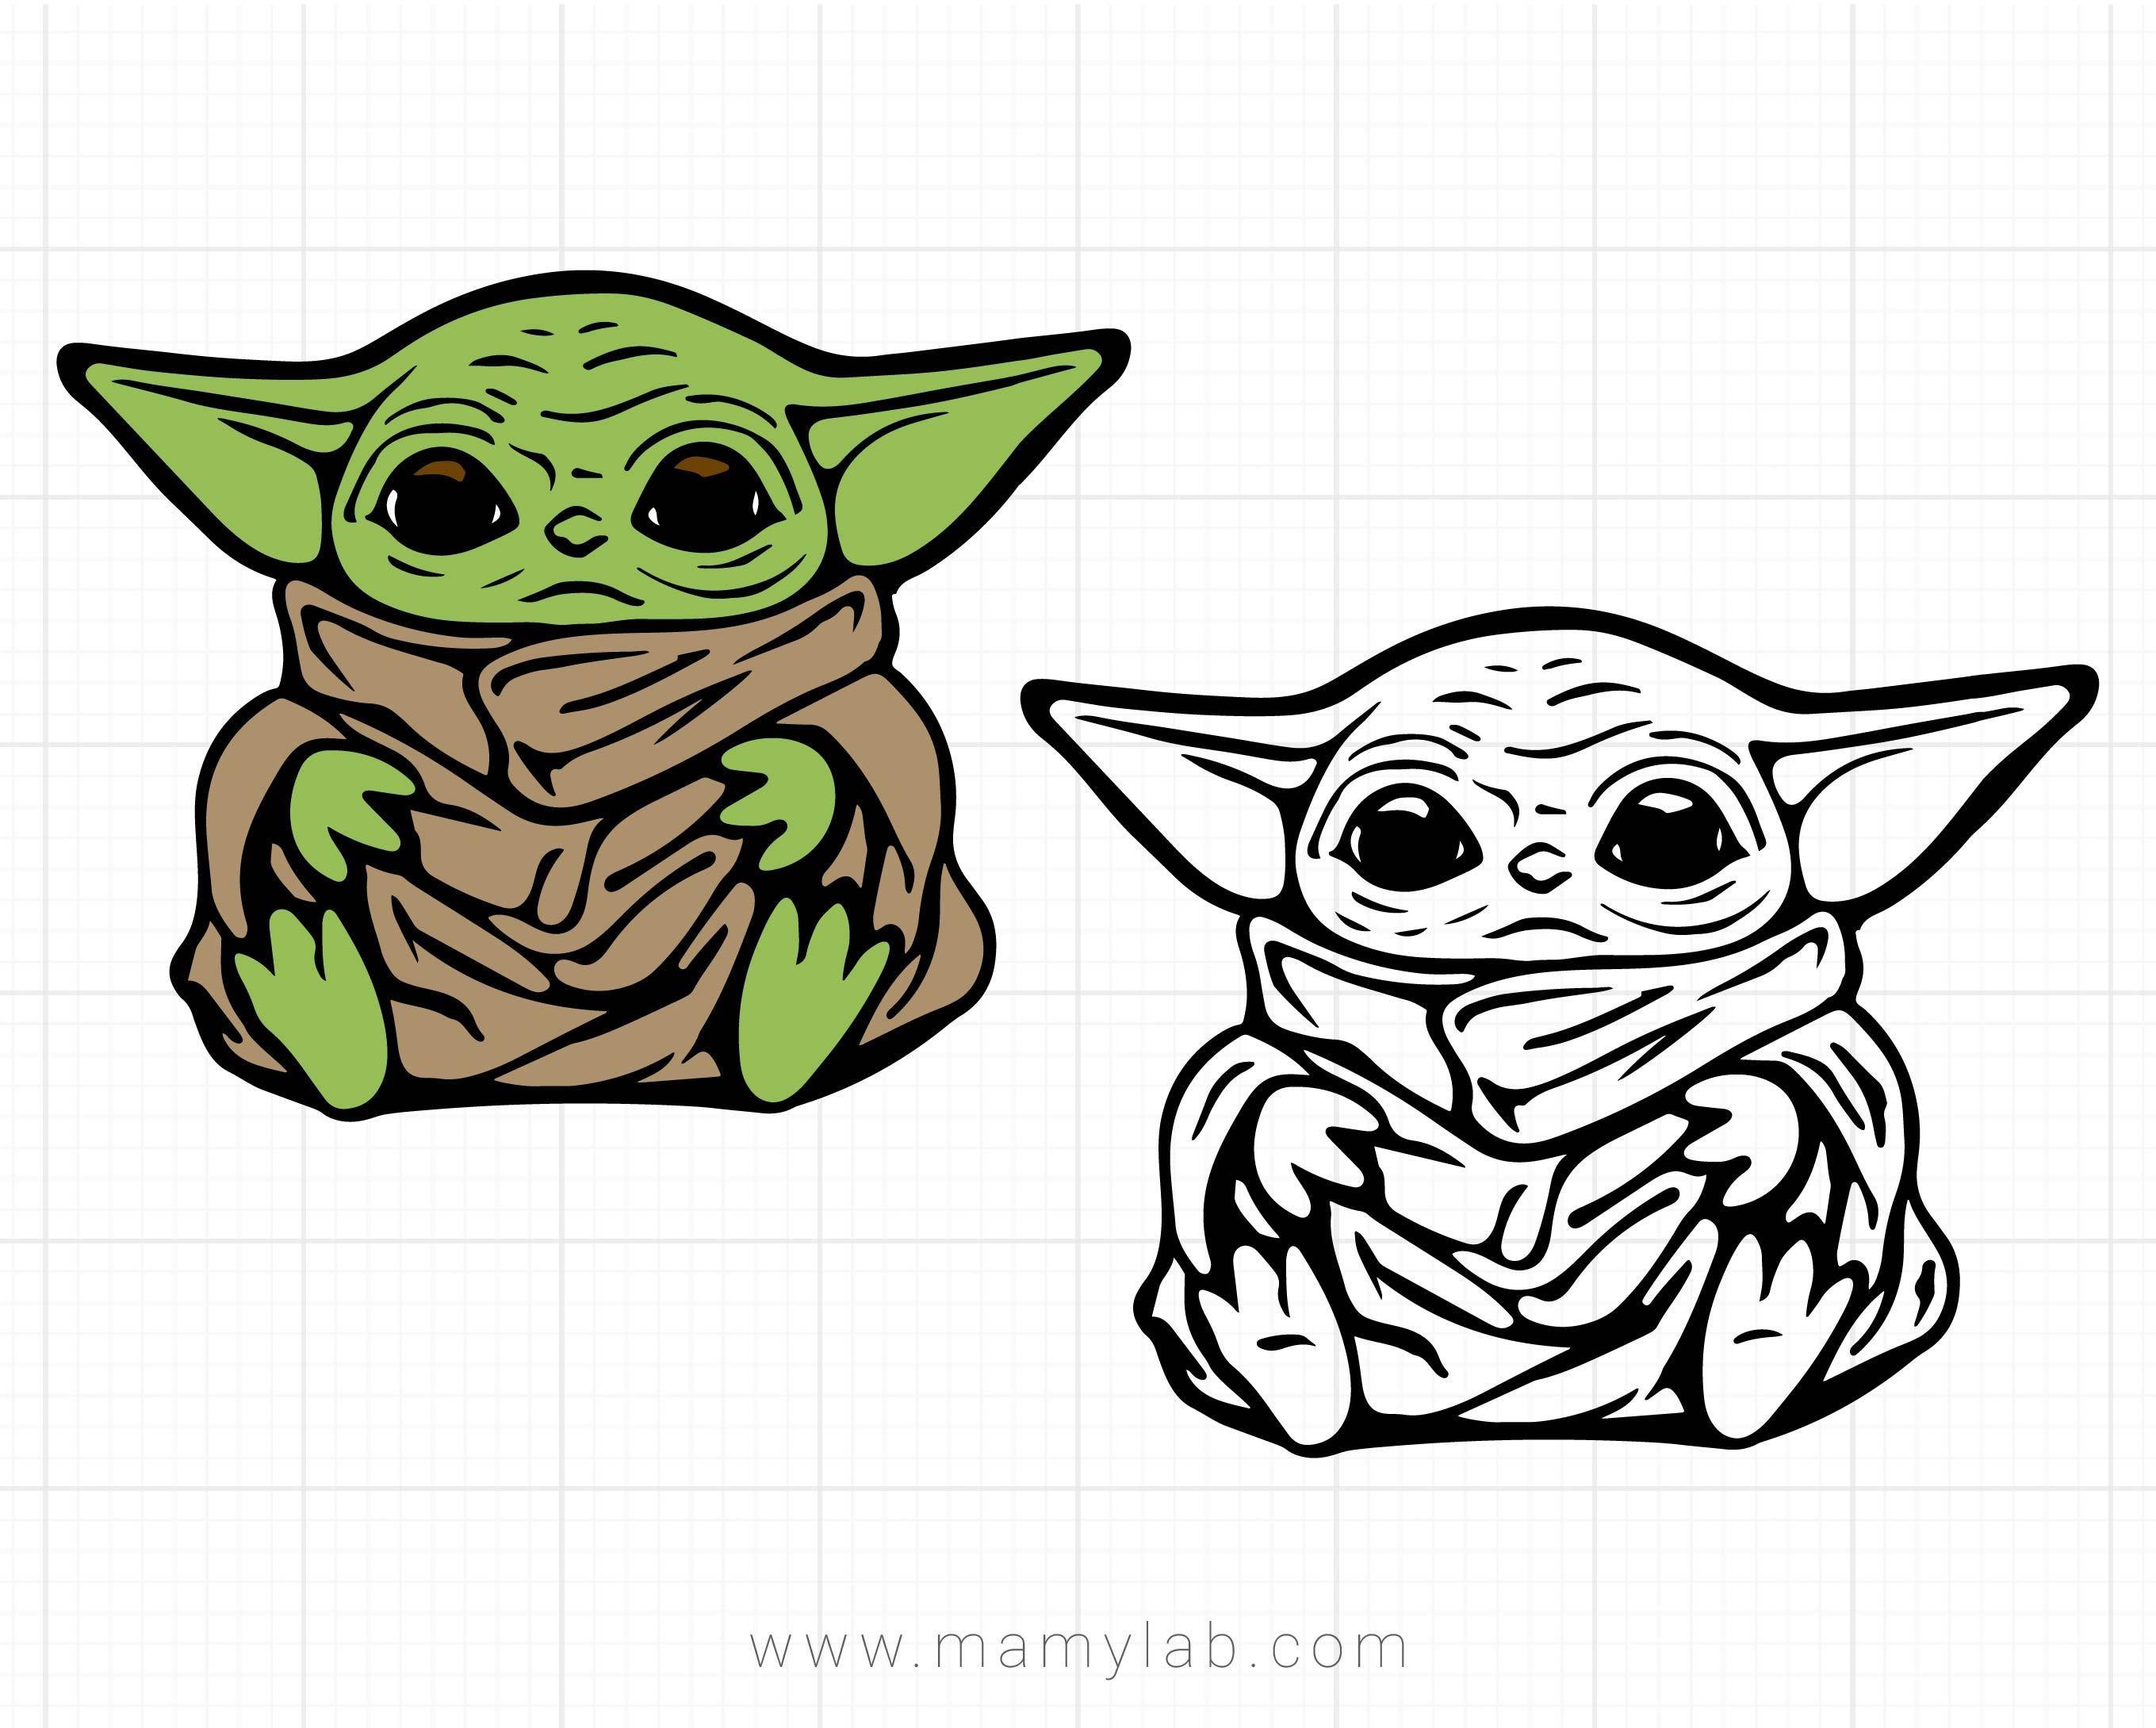 Baby Yoda Svg Star Wars The Mandalorian svg, Little Jedi